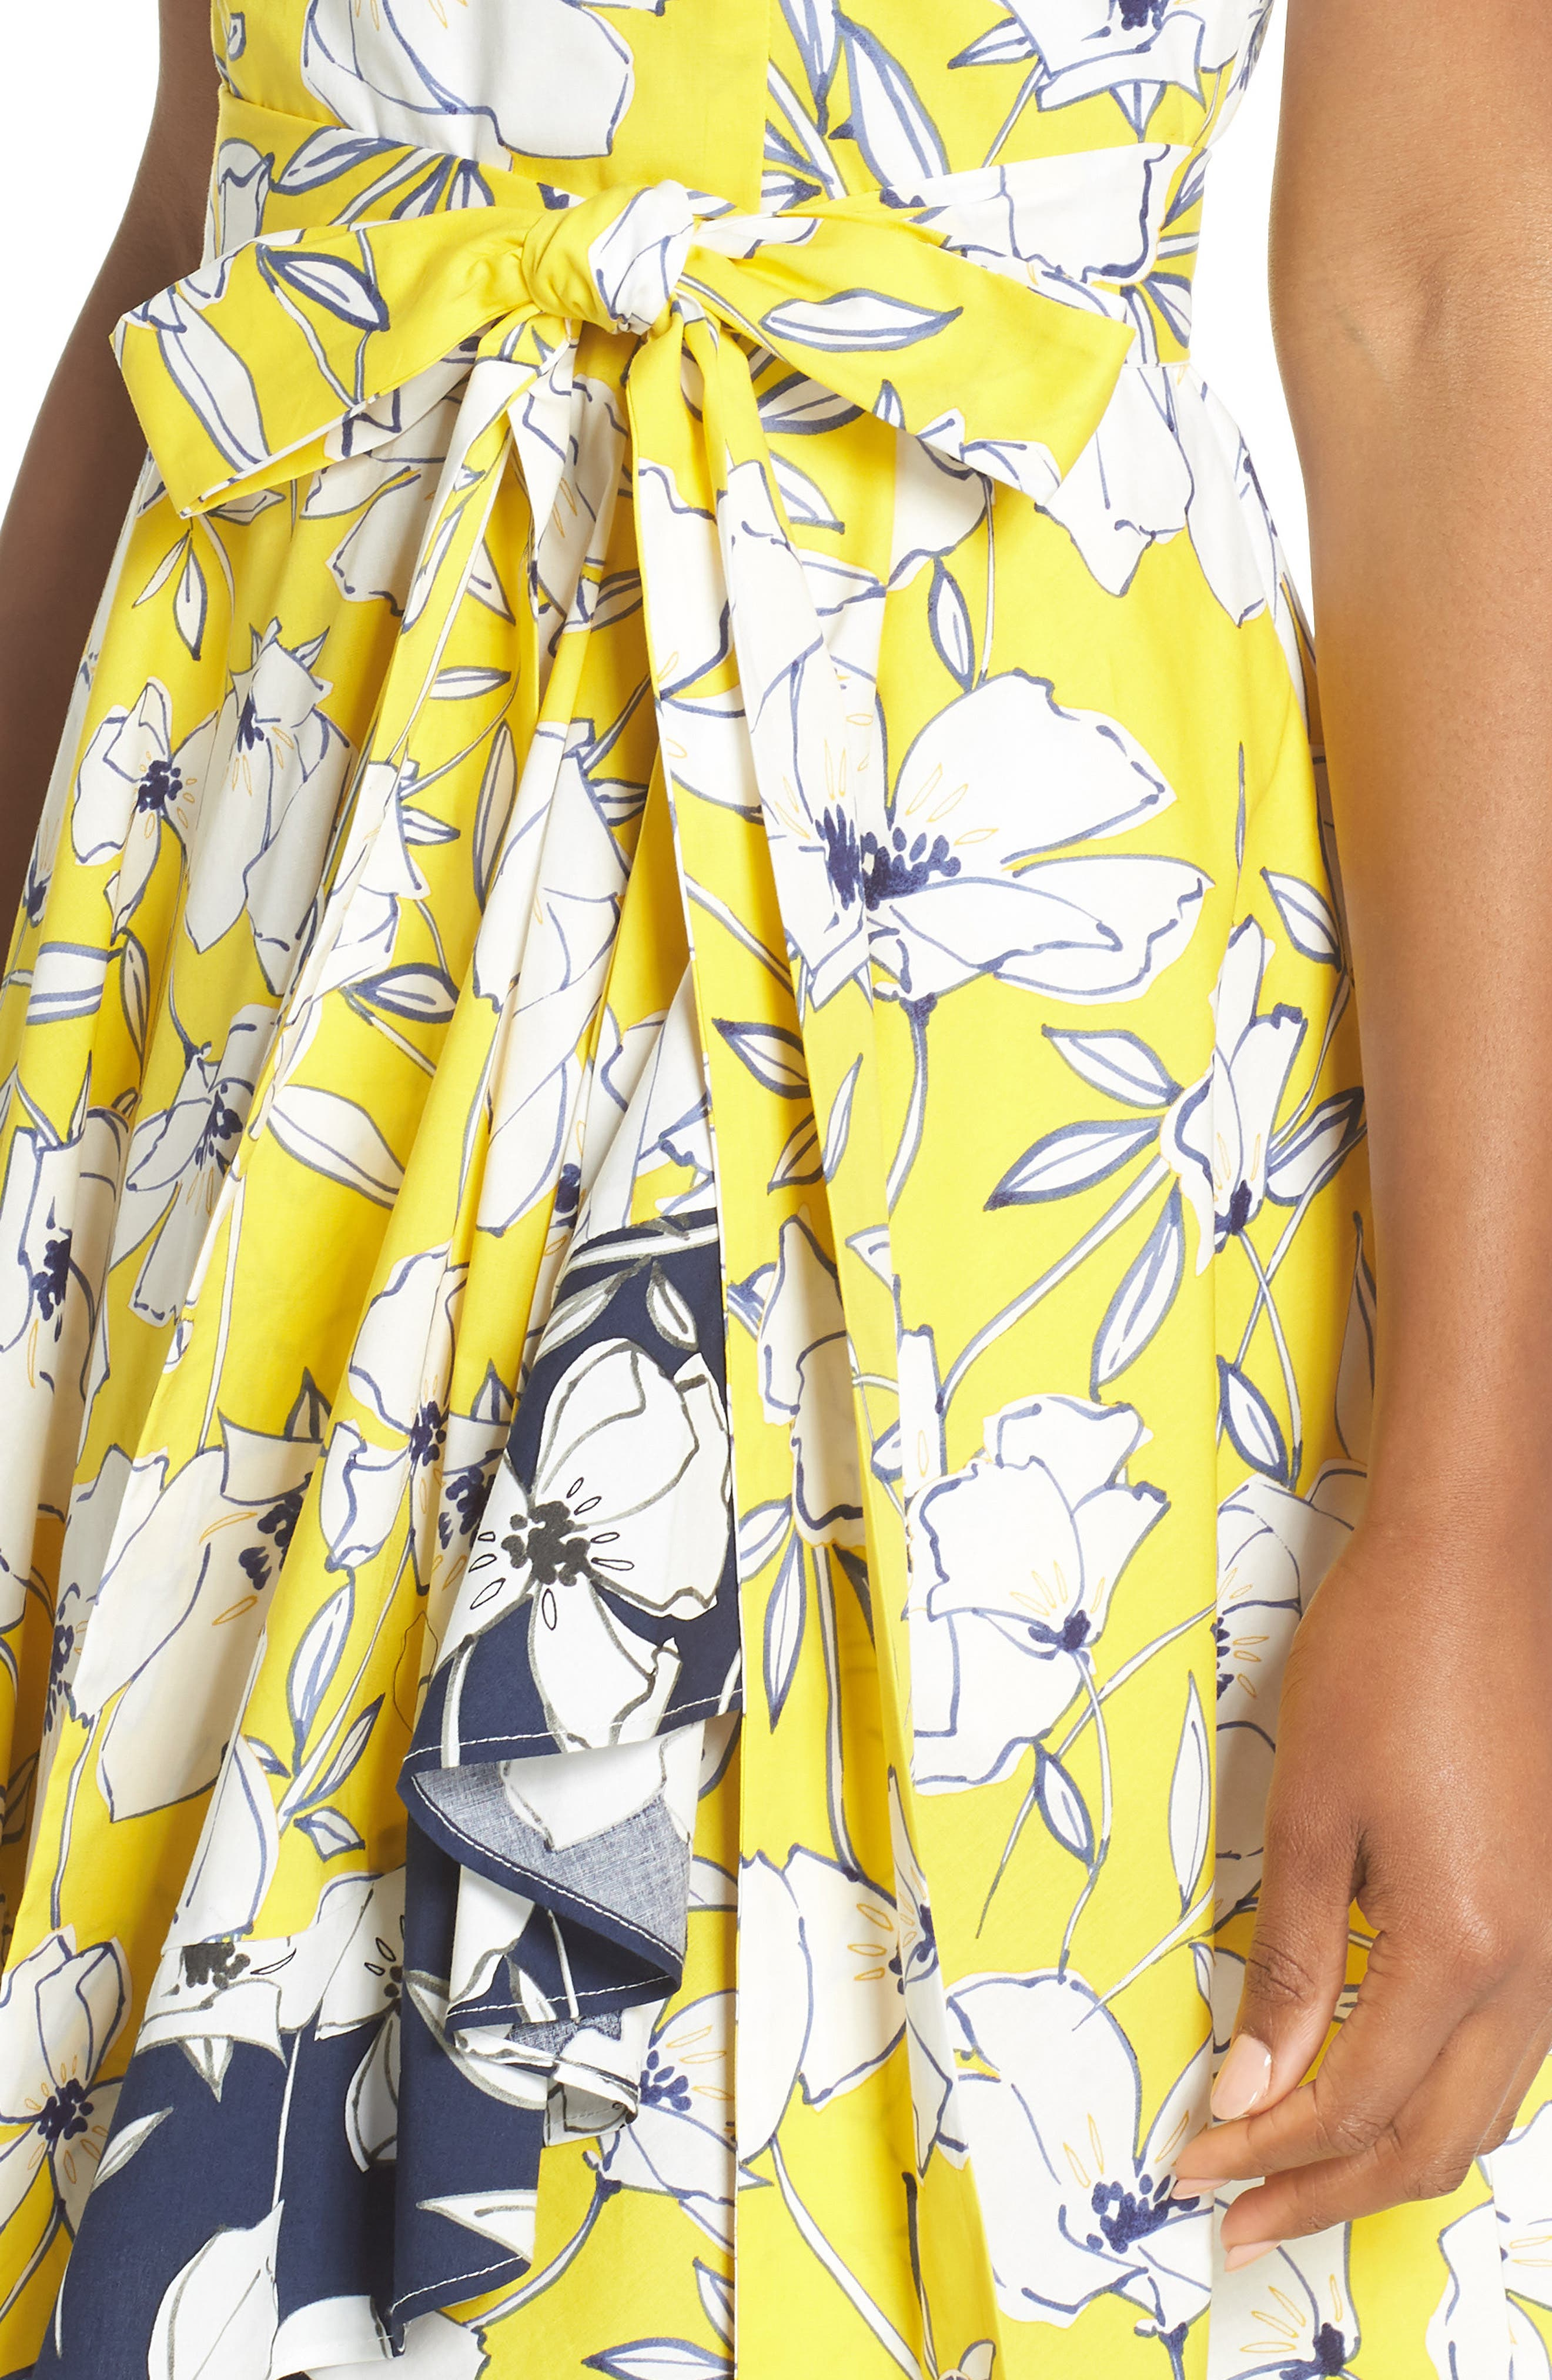 Floral Tie Waist Dress,                             Alternate thumbnail 4, color,                             Yellow/ Navy/ White